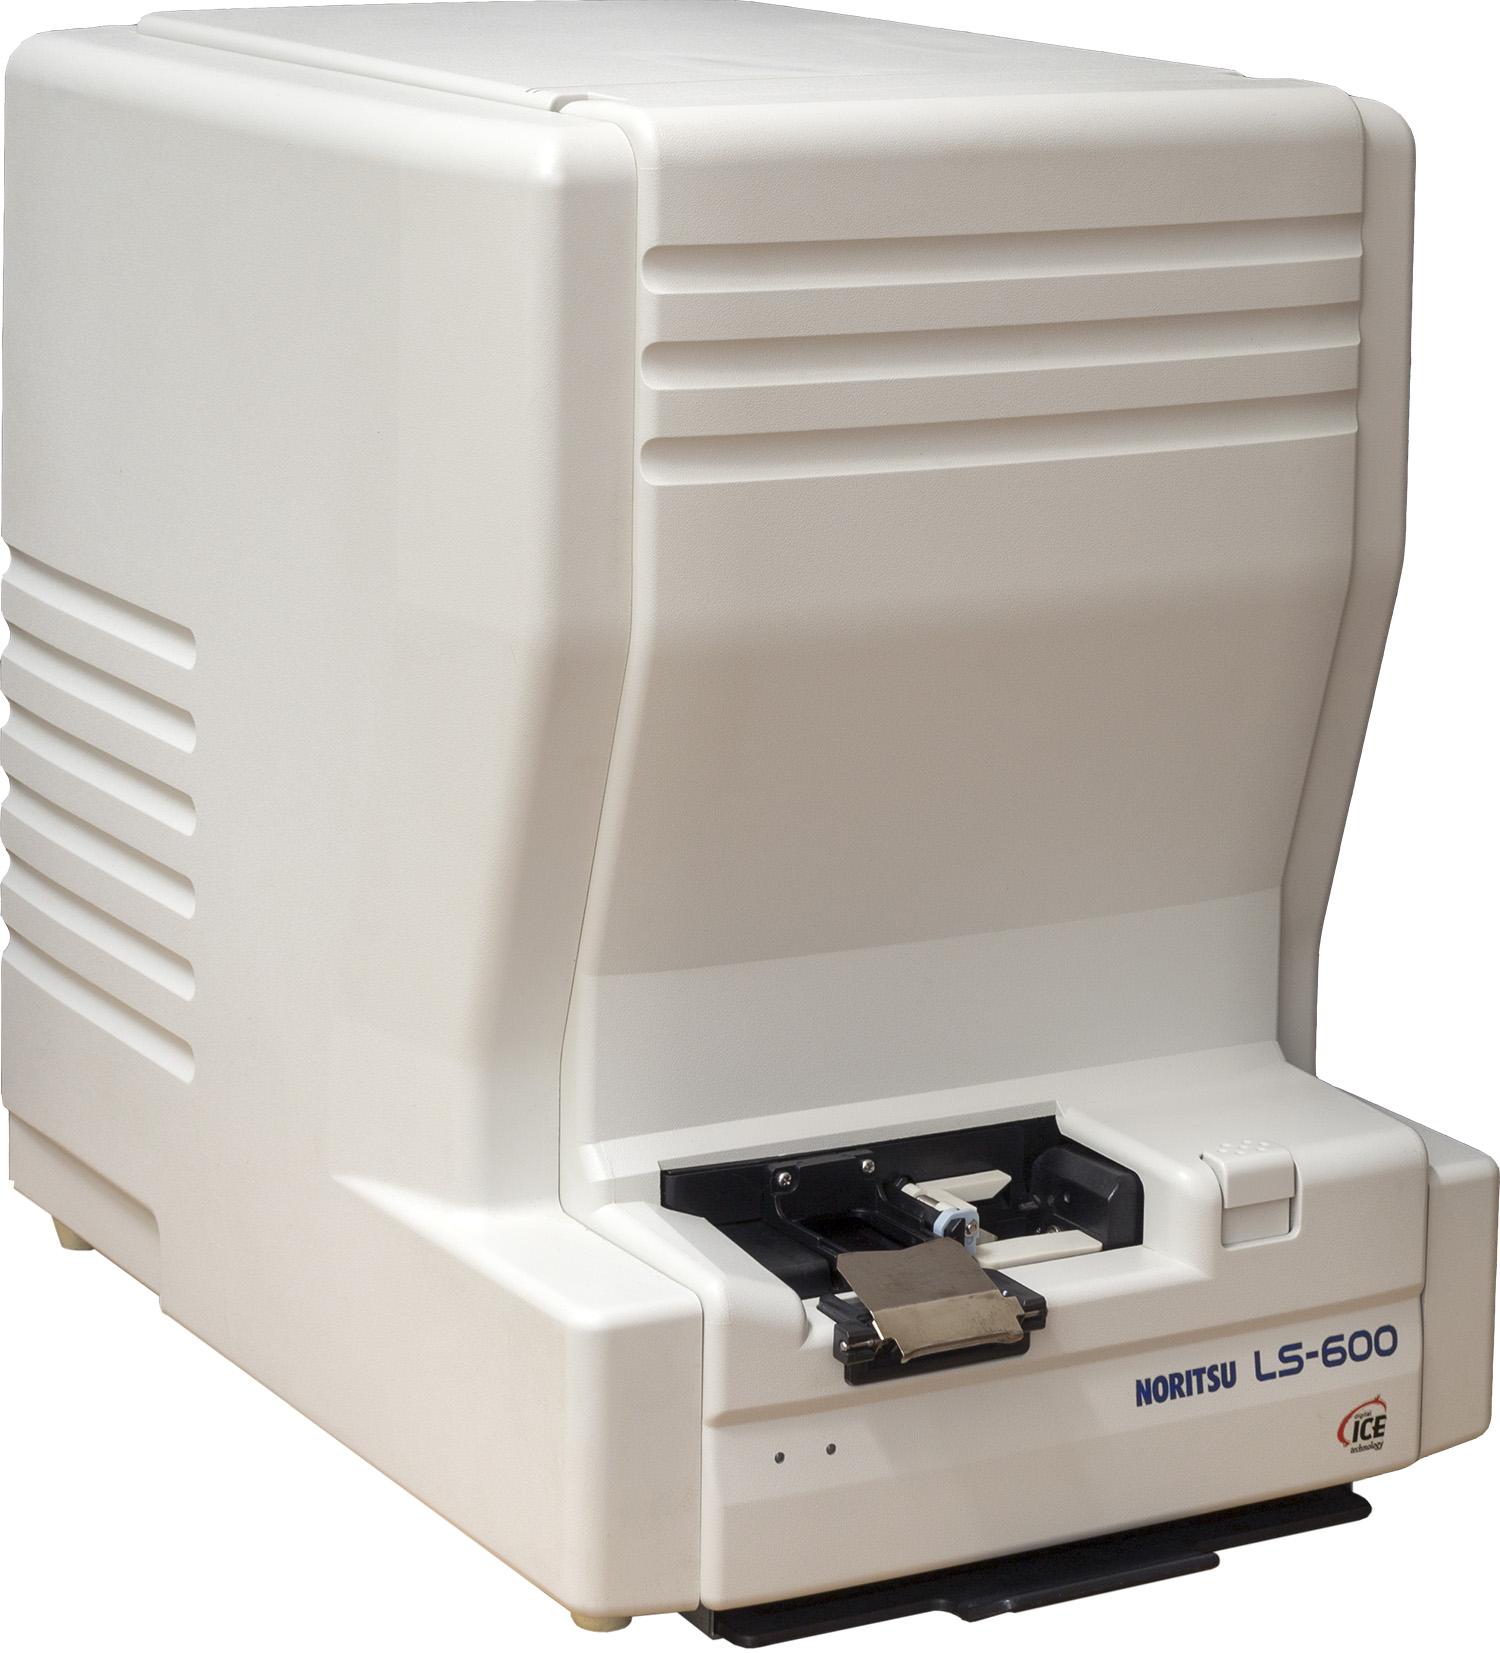 Noritsu LS-600 skener